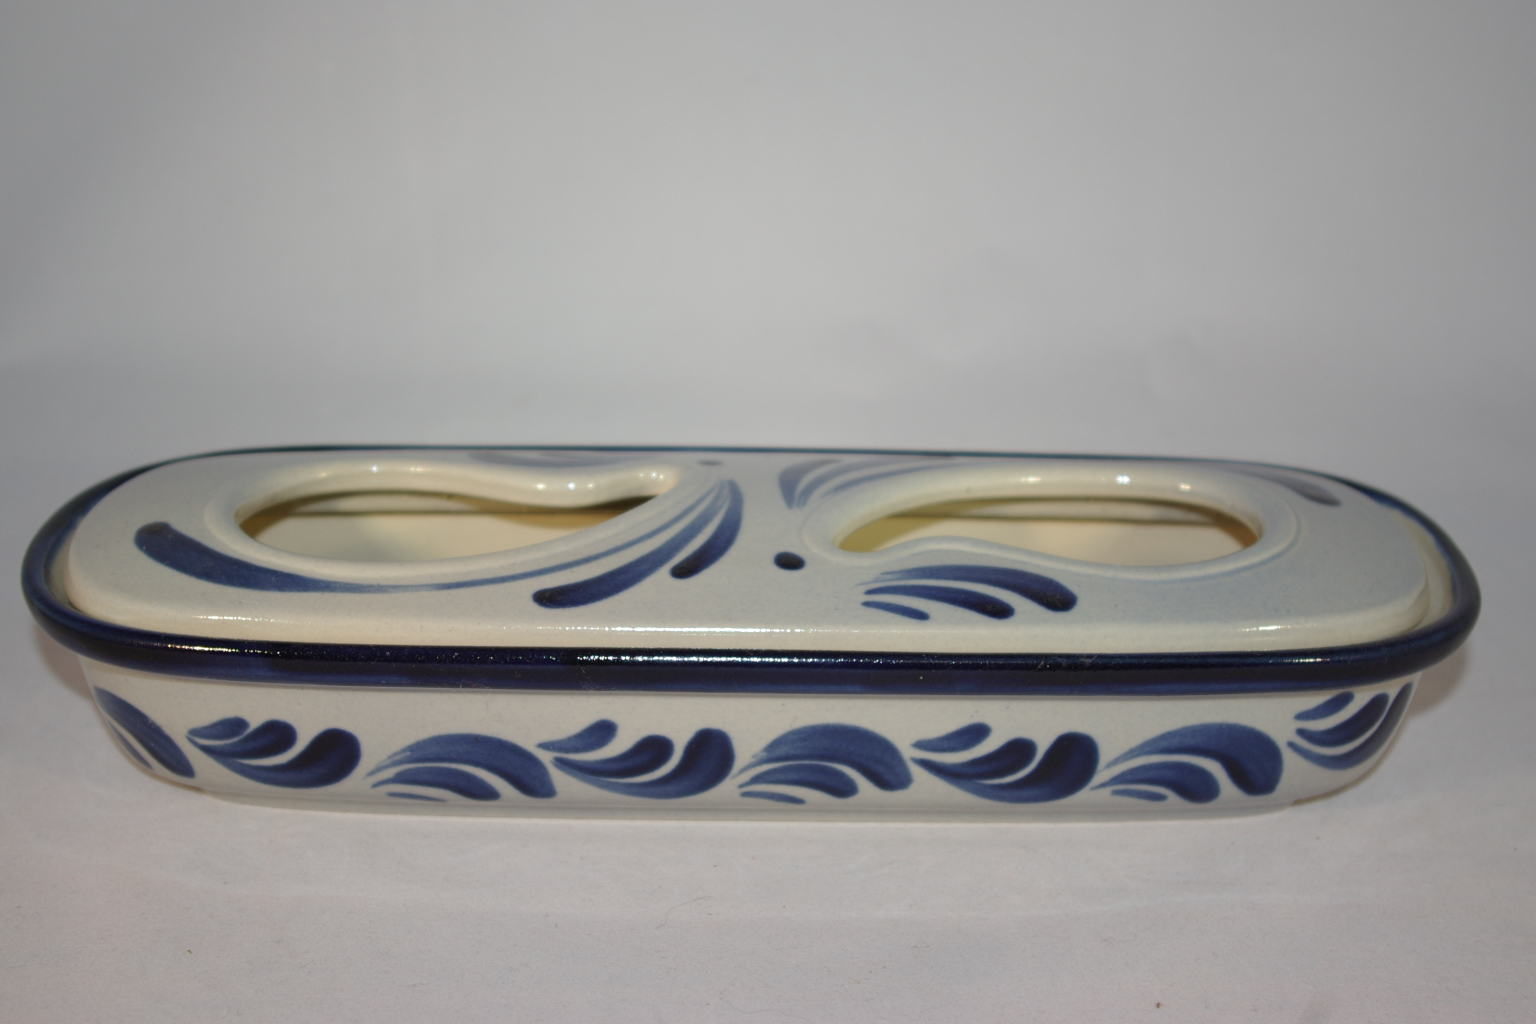 Keramik Wassserverdunster Heizung Grau Blau Bembel Shop Bembel